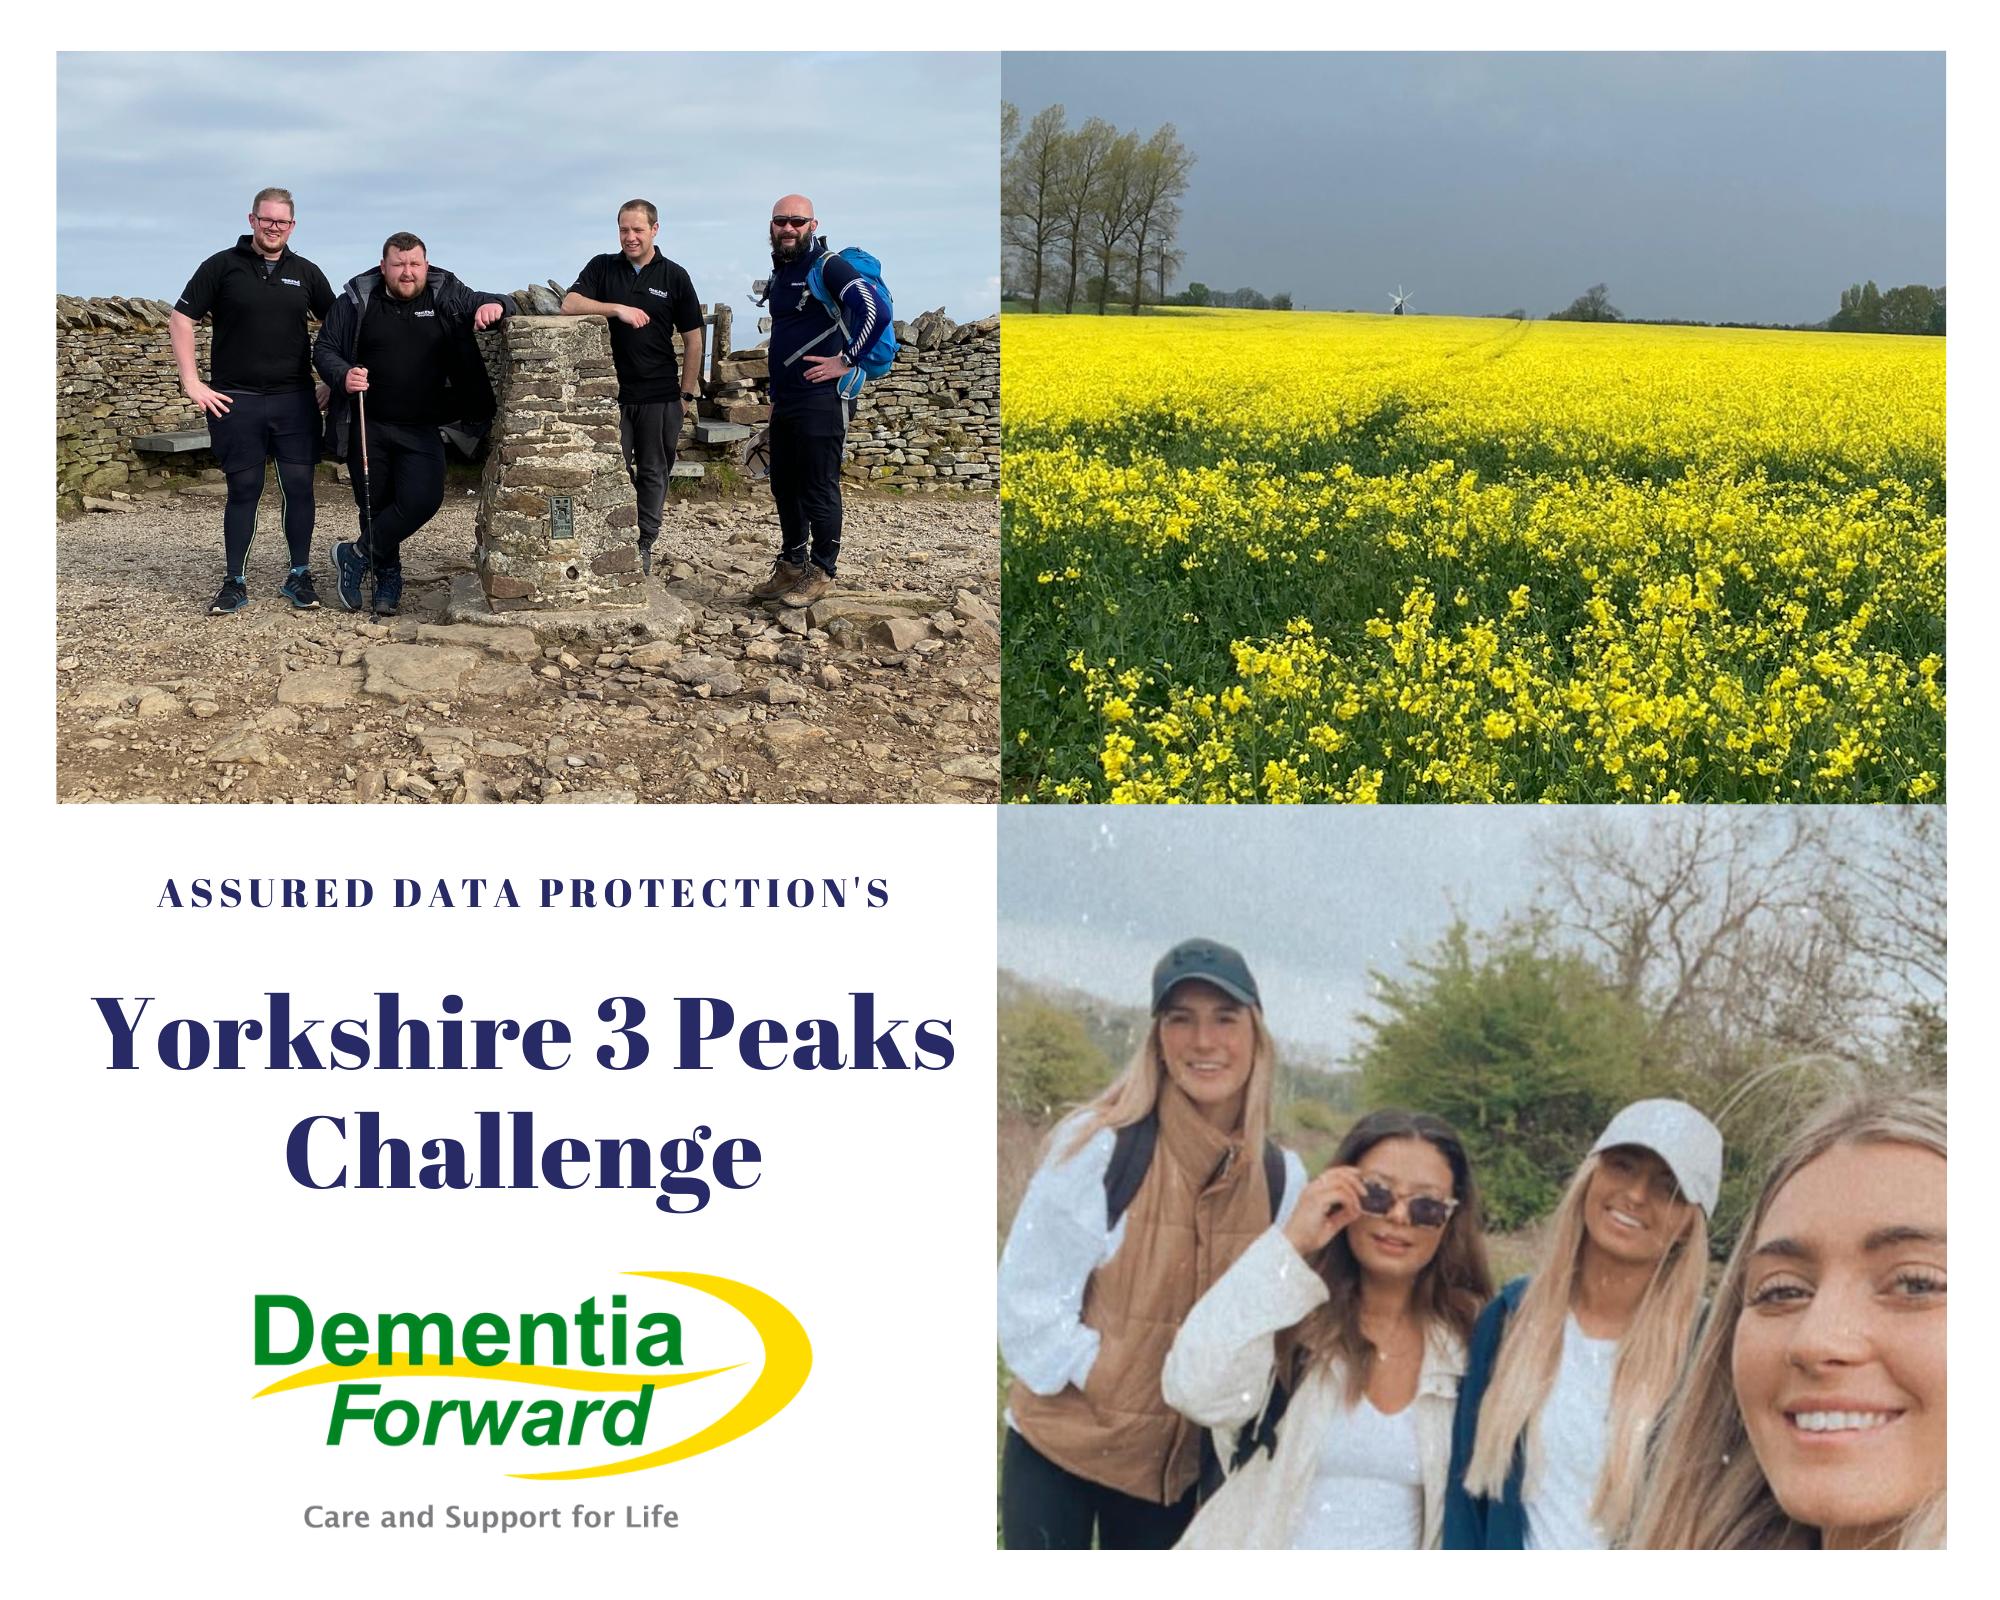 Assured Data Protection's Yorkshire 3 Peaks Challenge - Mid-Challenge Progress Update